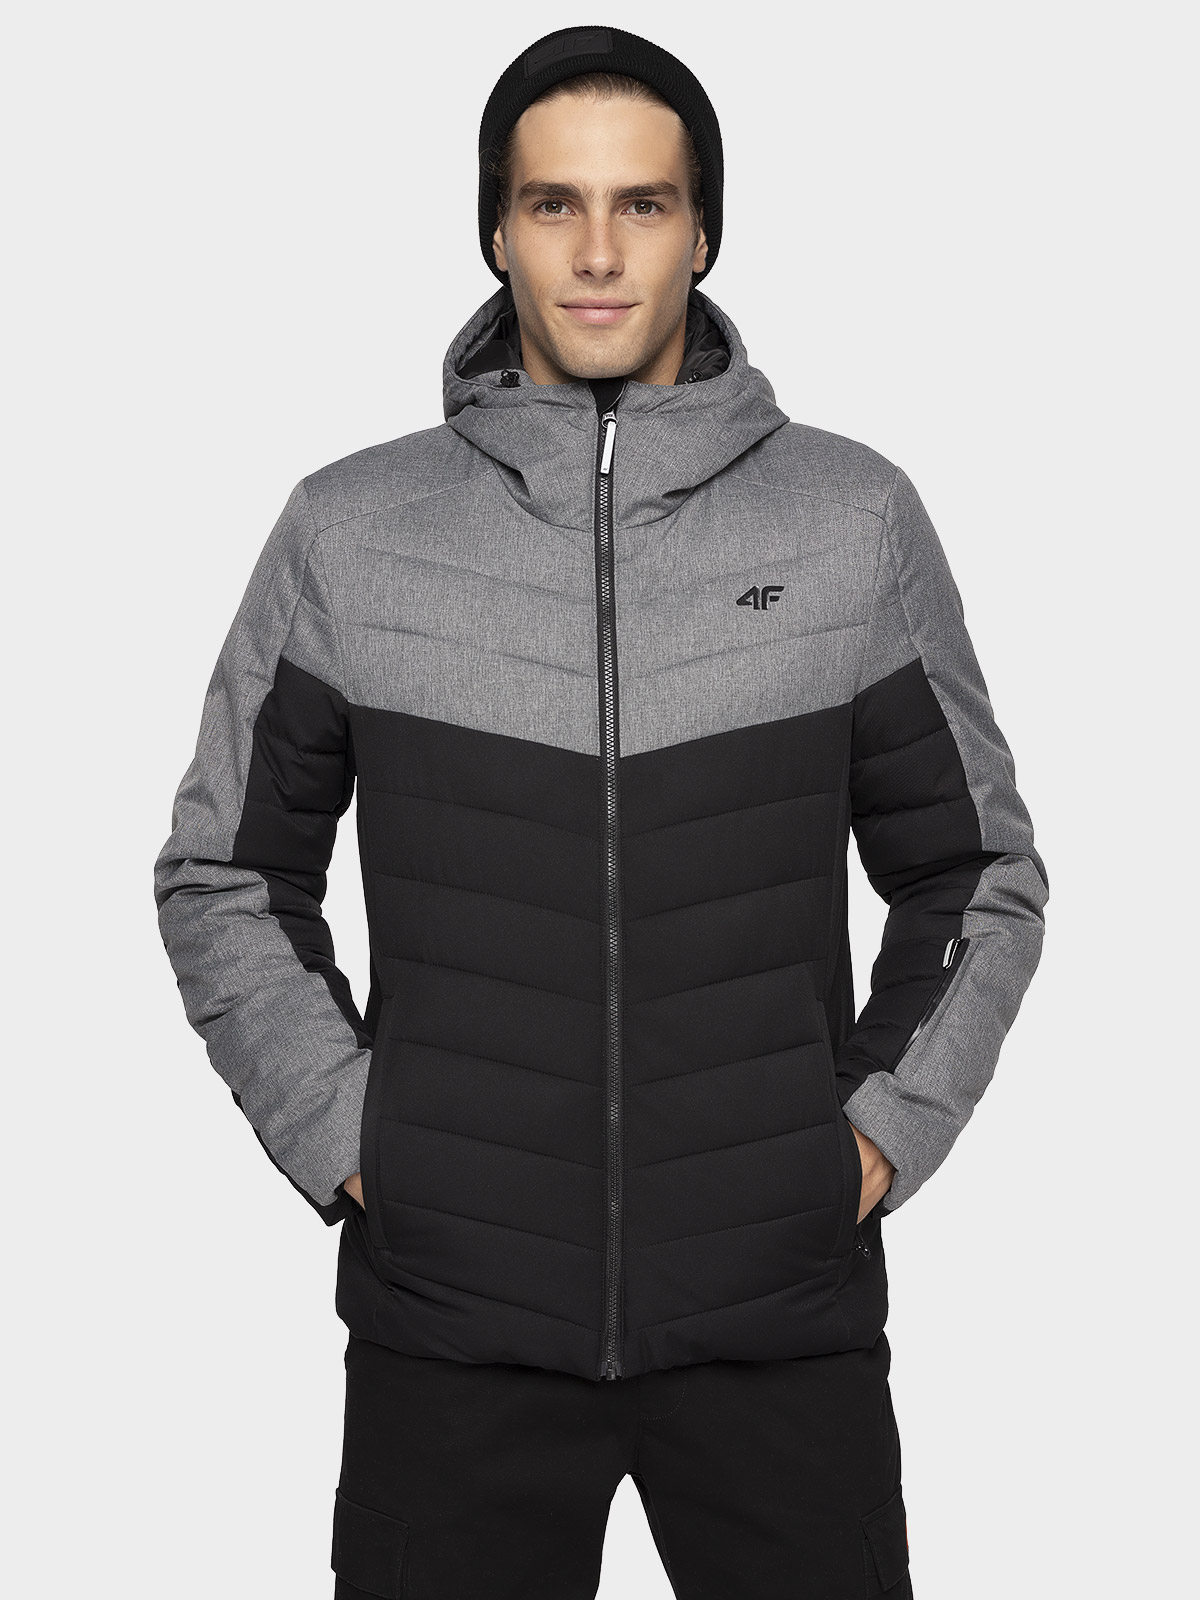 Jachetă pentru bărbați KUMP205 - negru intens